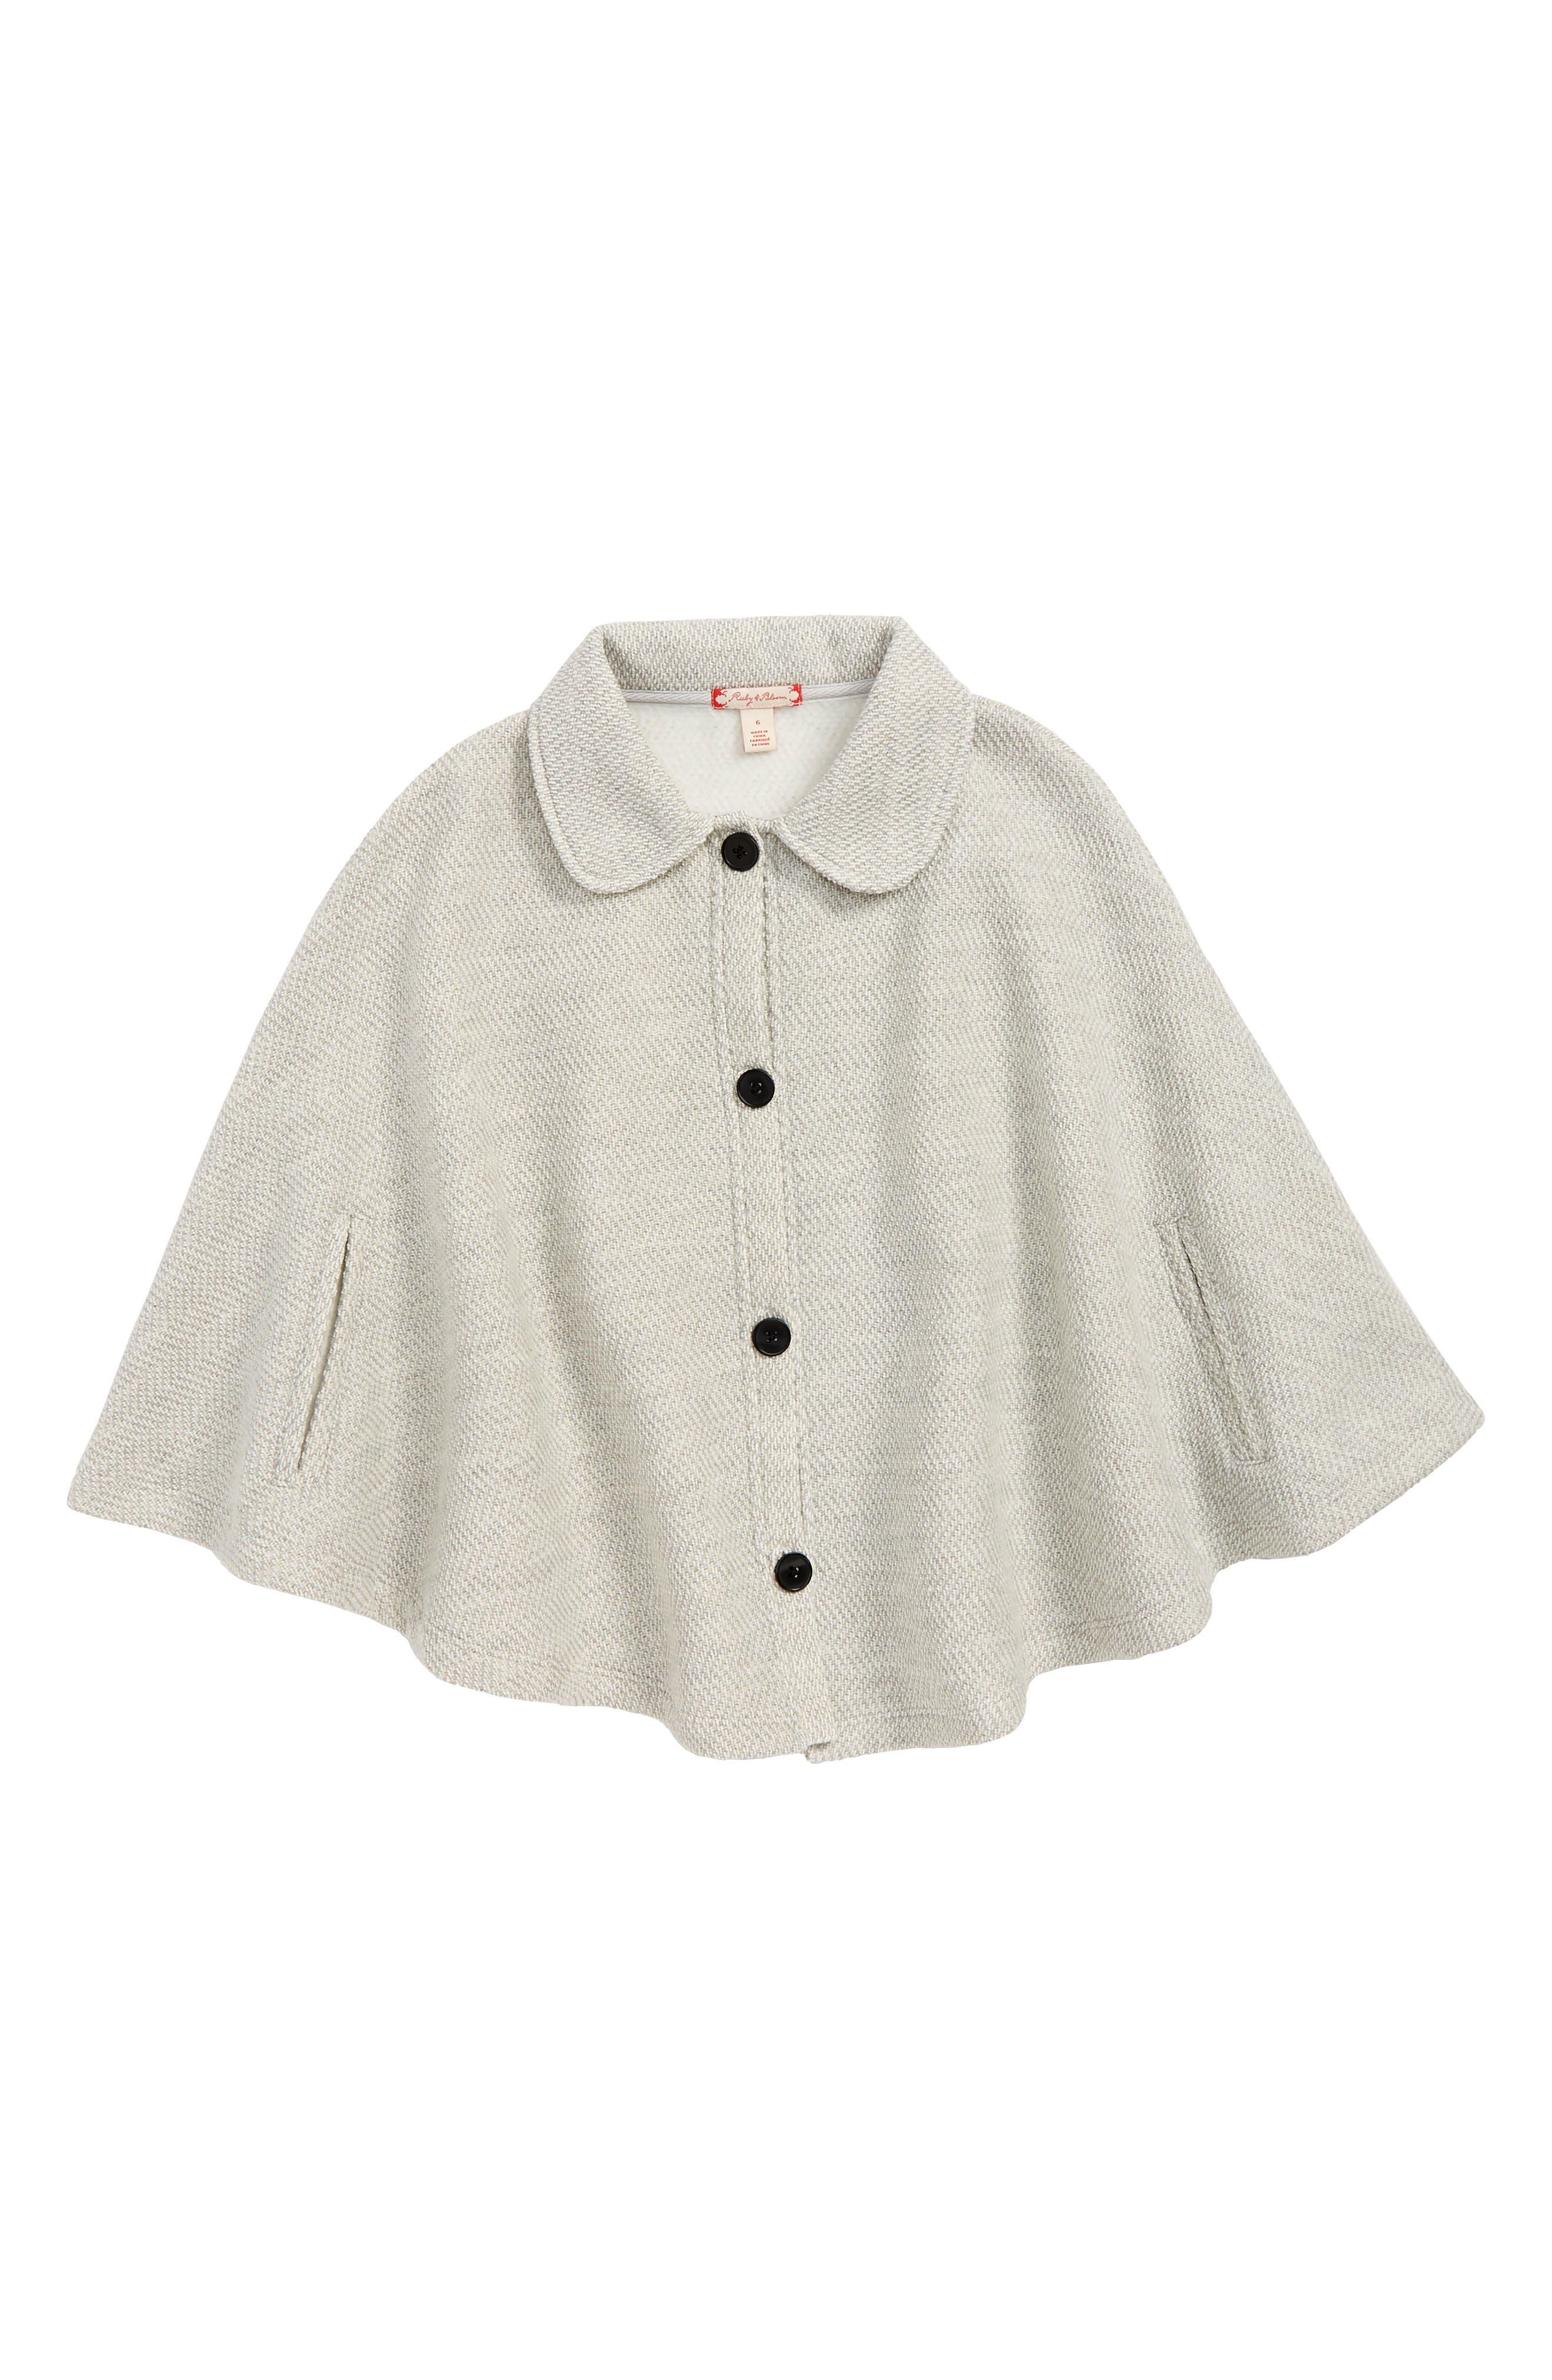 Girls Ruby  Bloom Cozy Cape Size 4  Grey